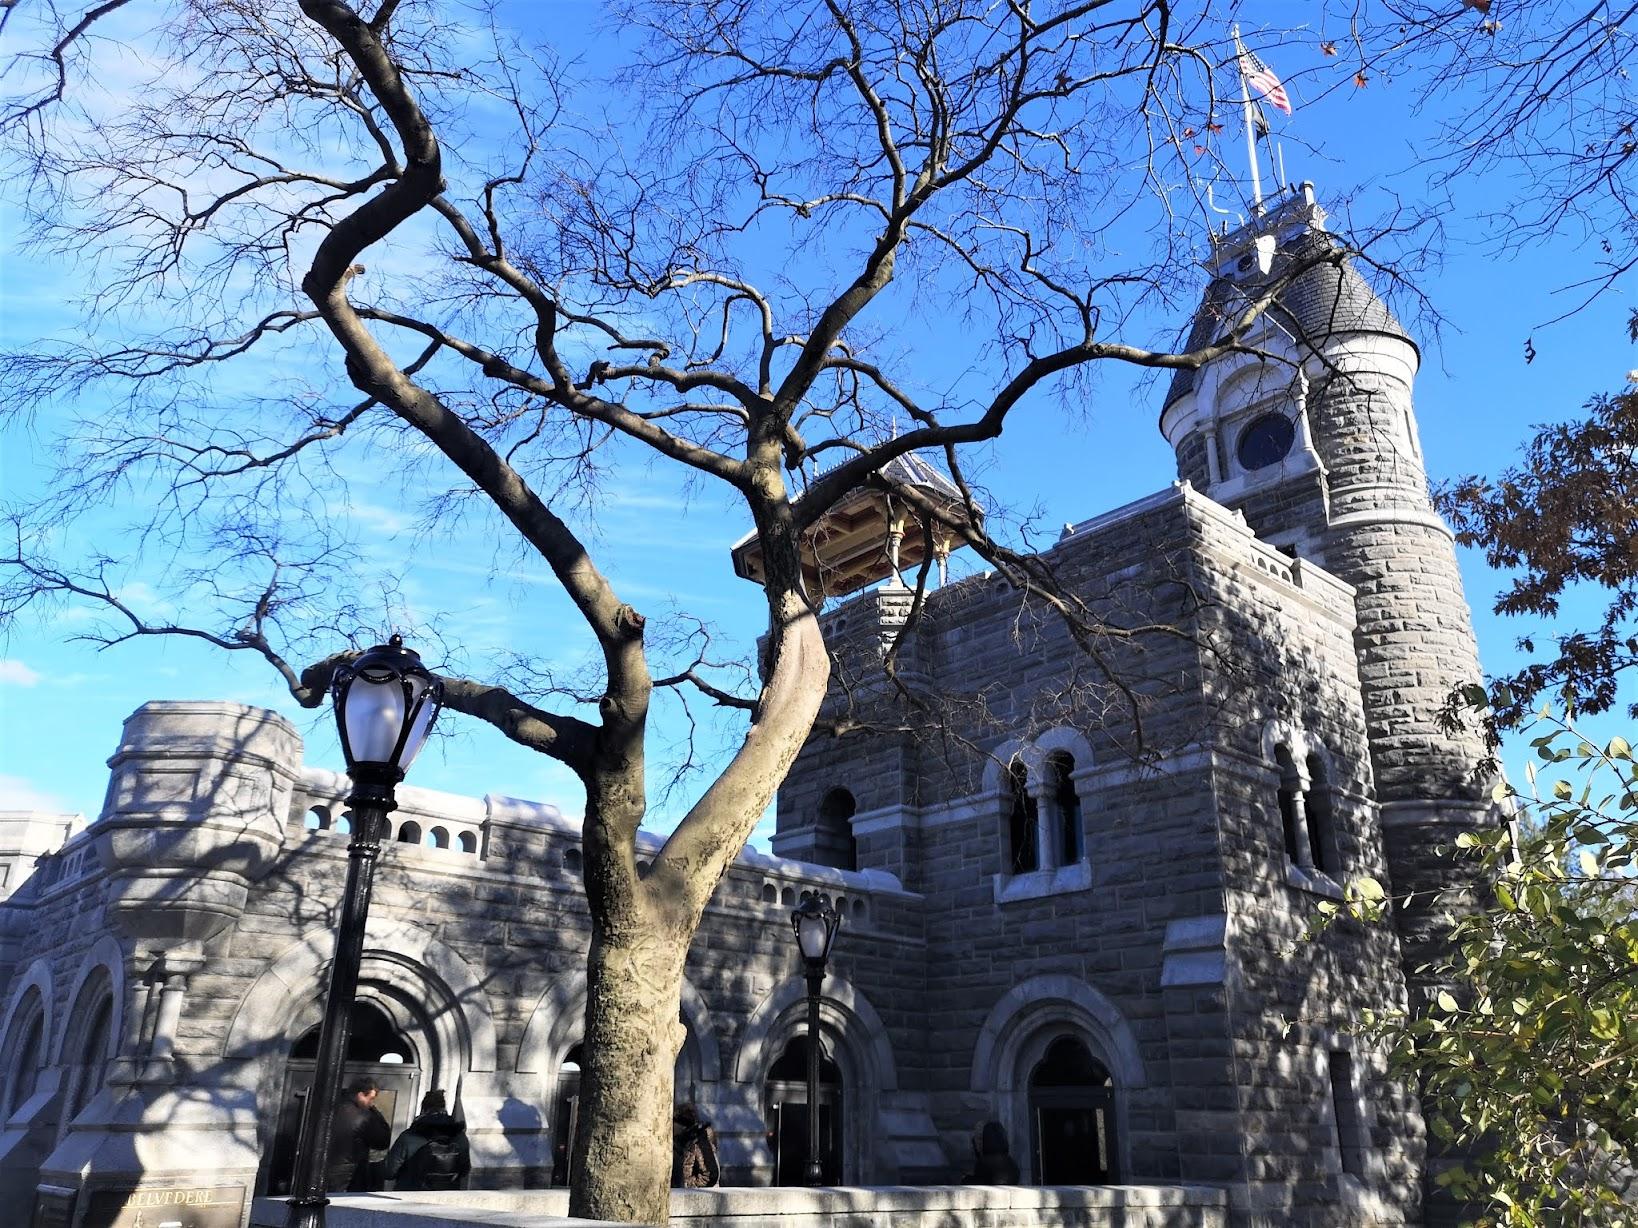 Belvedere Castle, Central Park, New York City